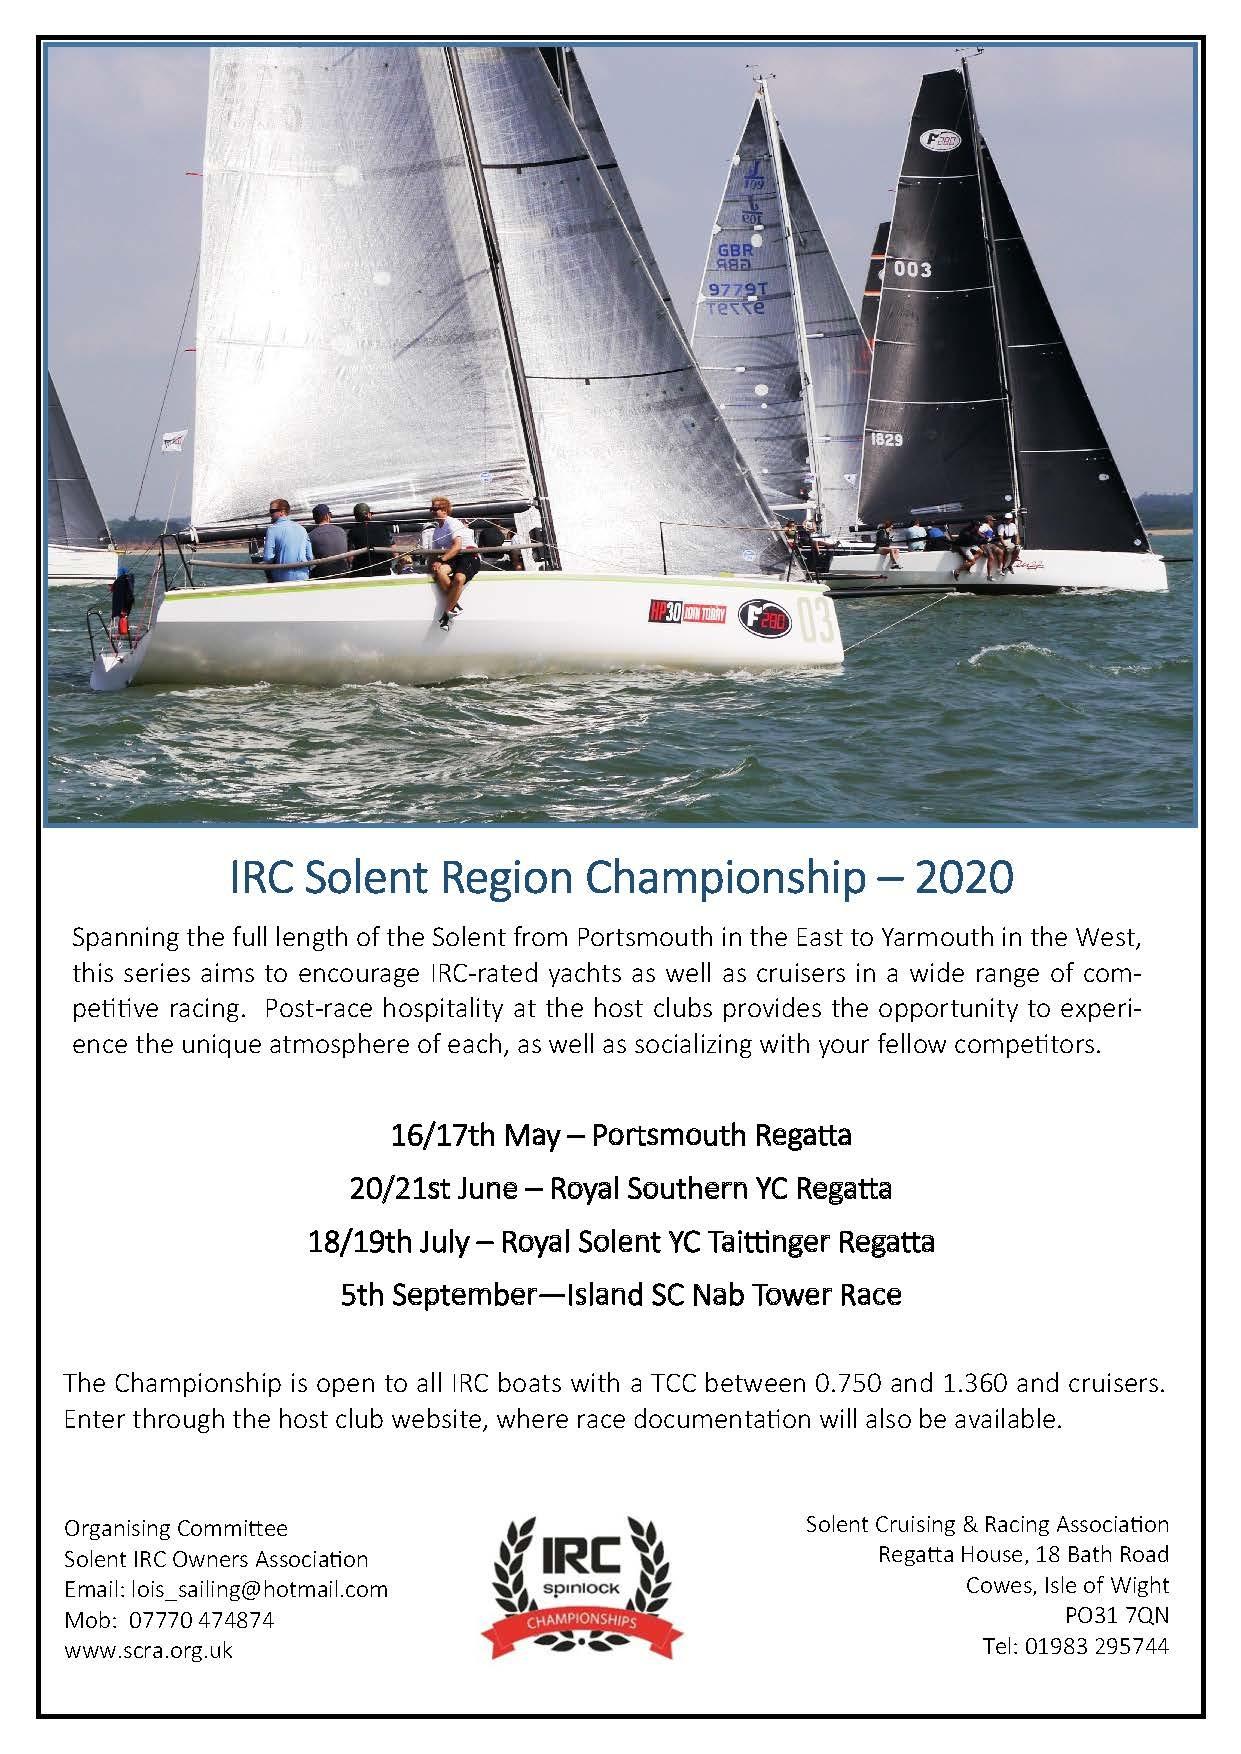 Championship 2020 Poster V2